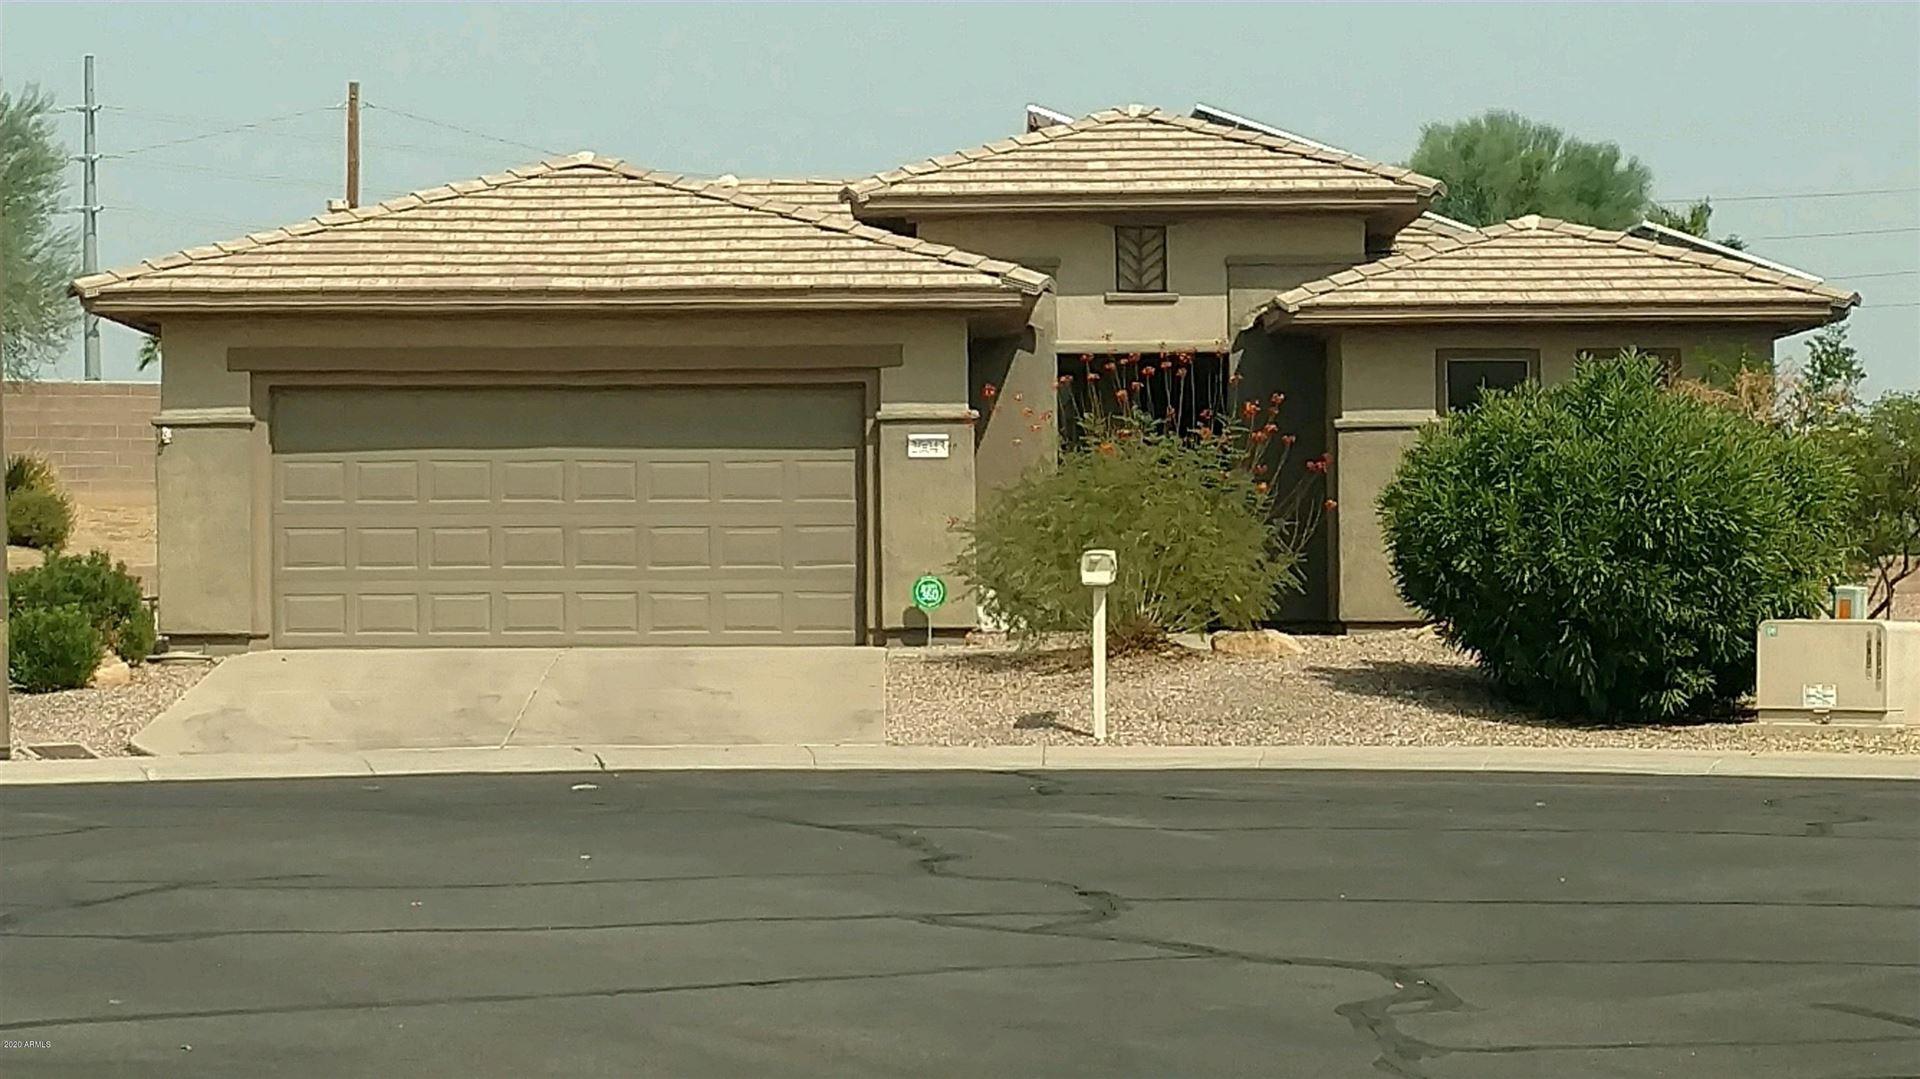 20043 N ORGAN PIPE Drive, Surprise, AZ 85374 - MLS#: 6134598